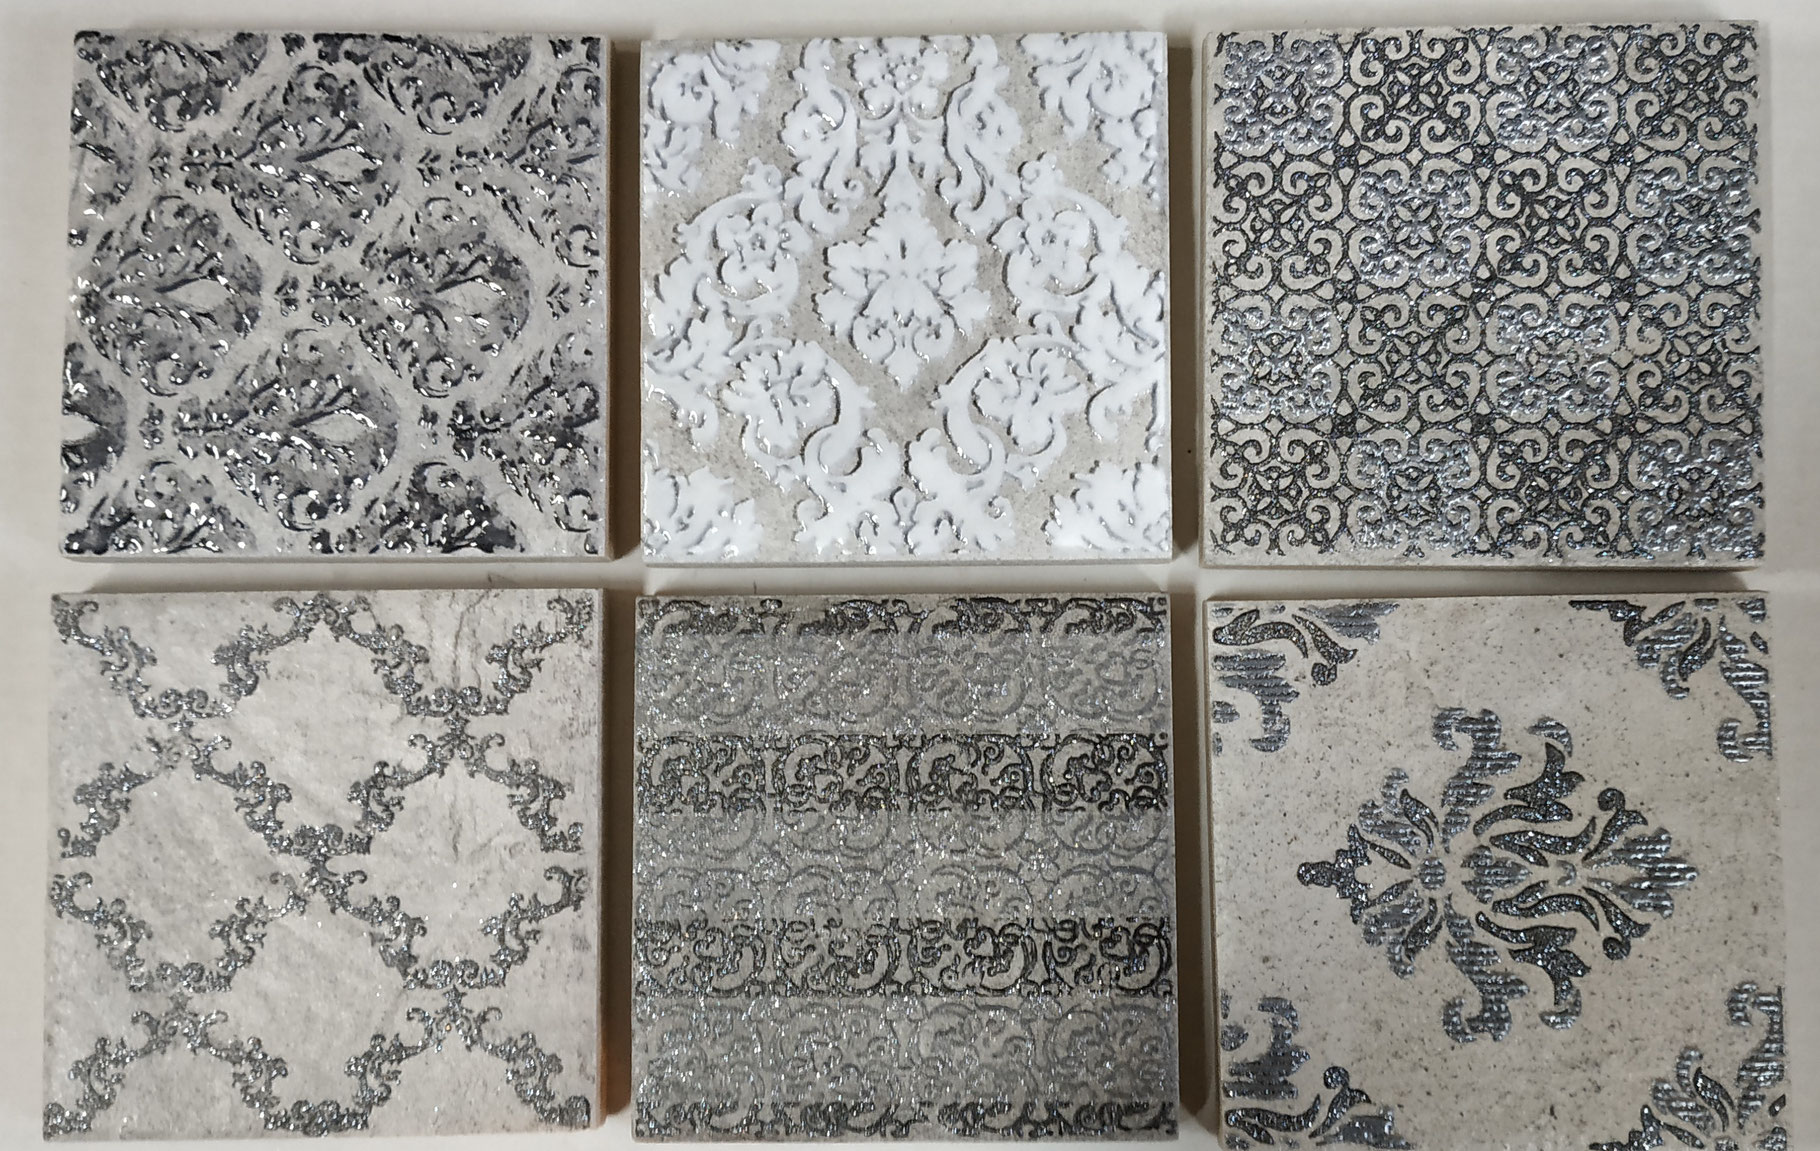 Piastrelle 10x10 Formelle,Inserti - CeramicheMetis Materiale ...